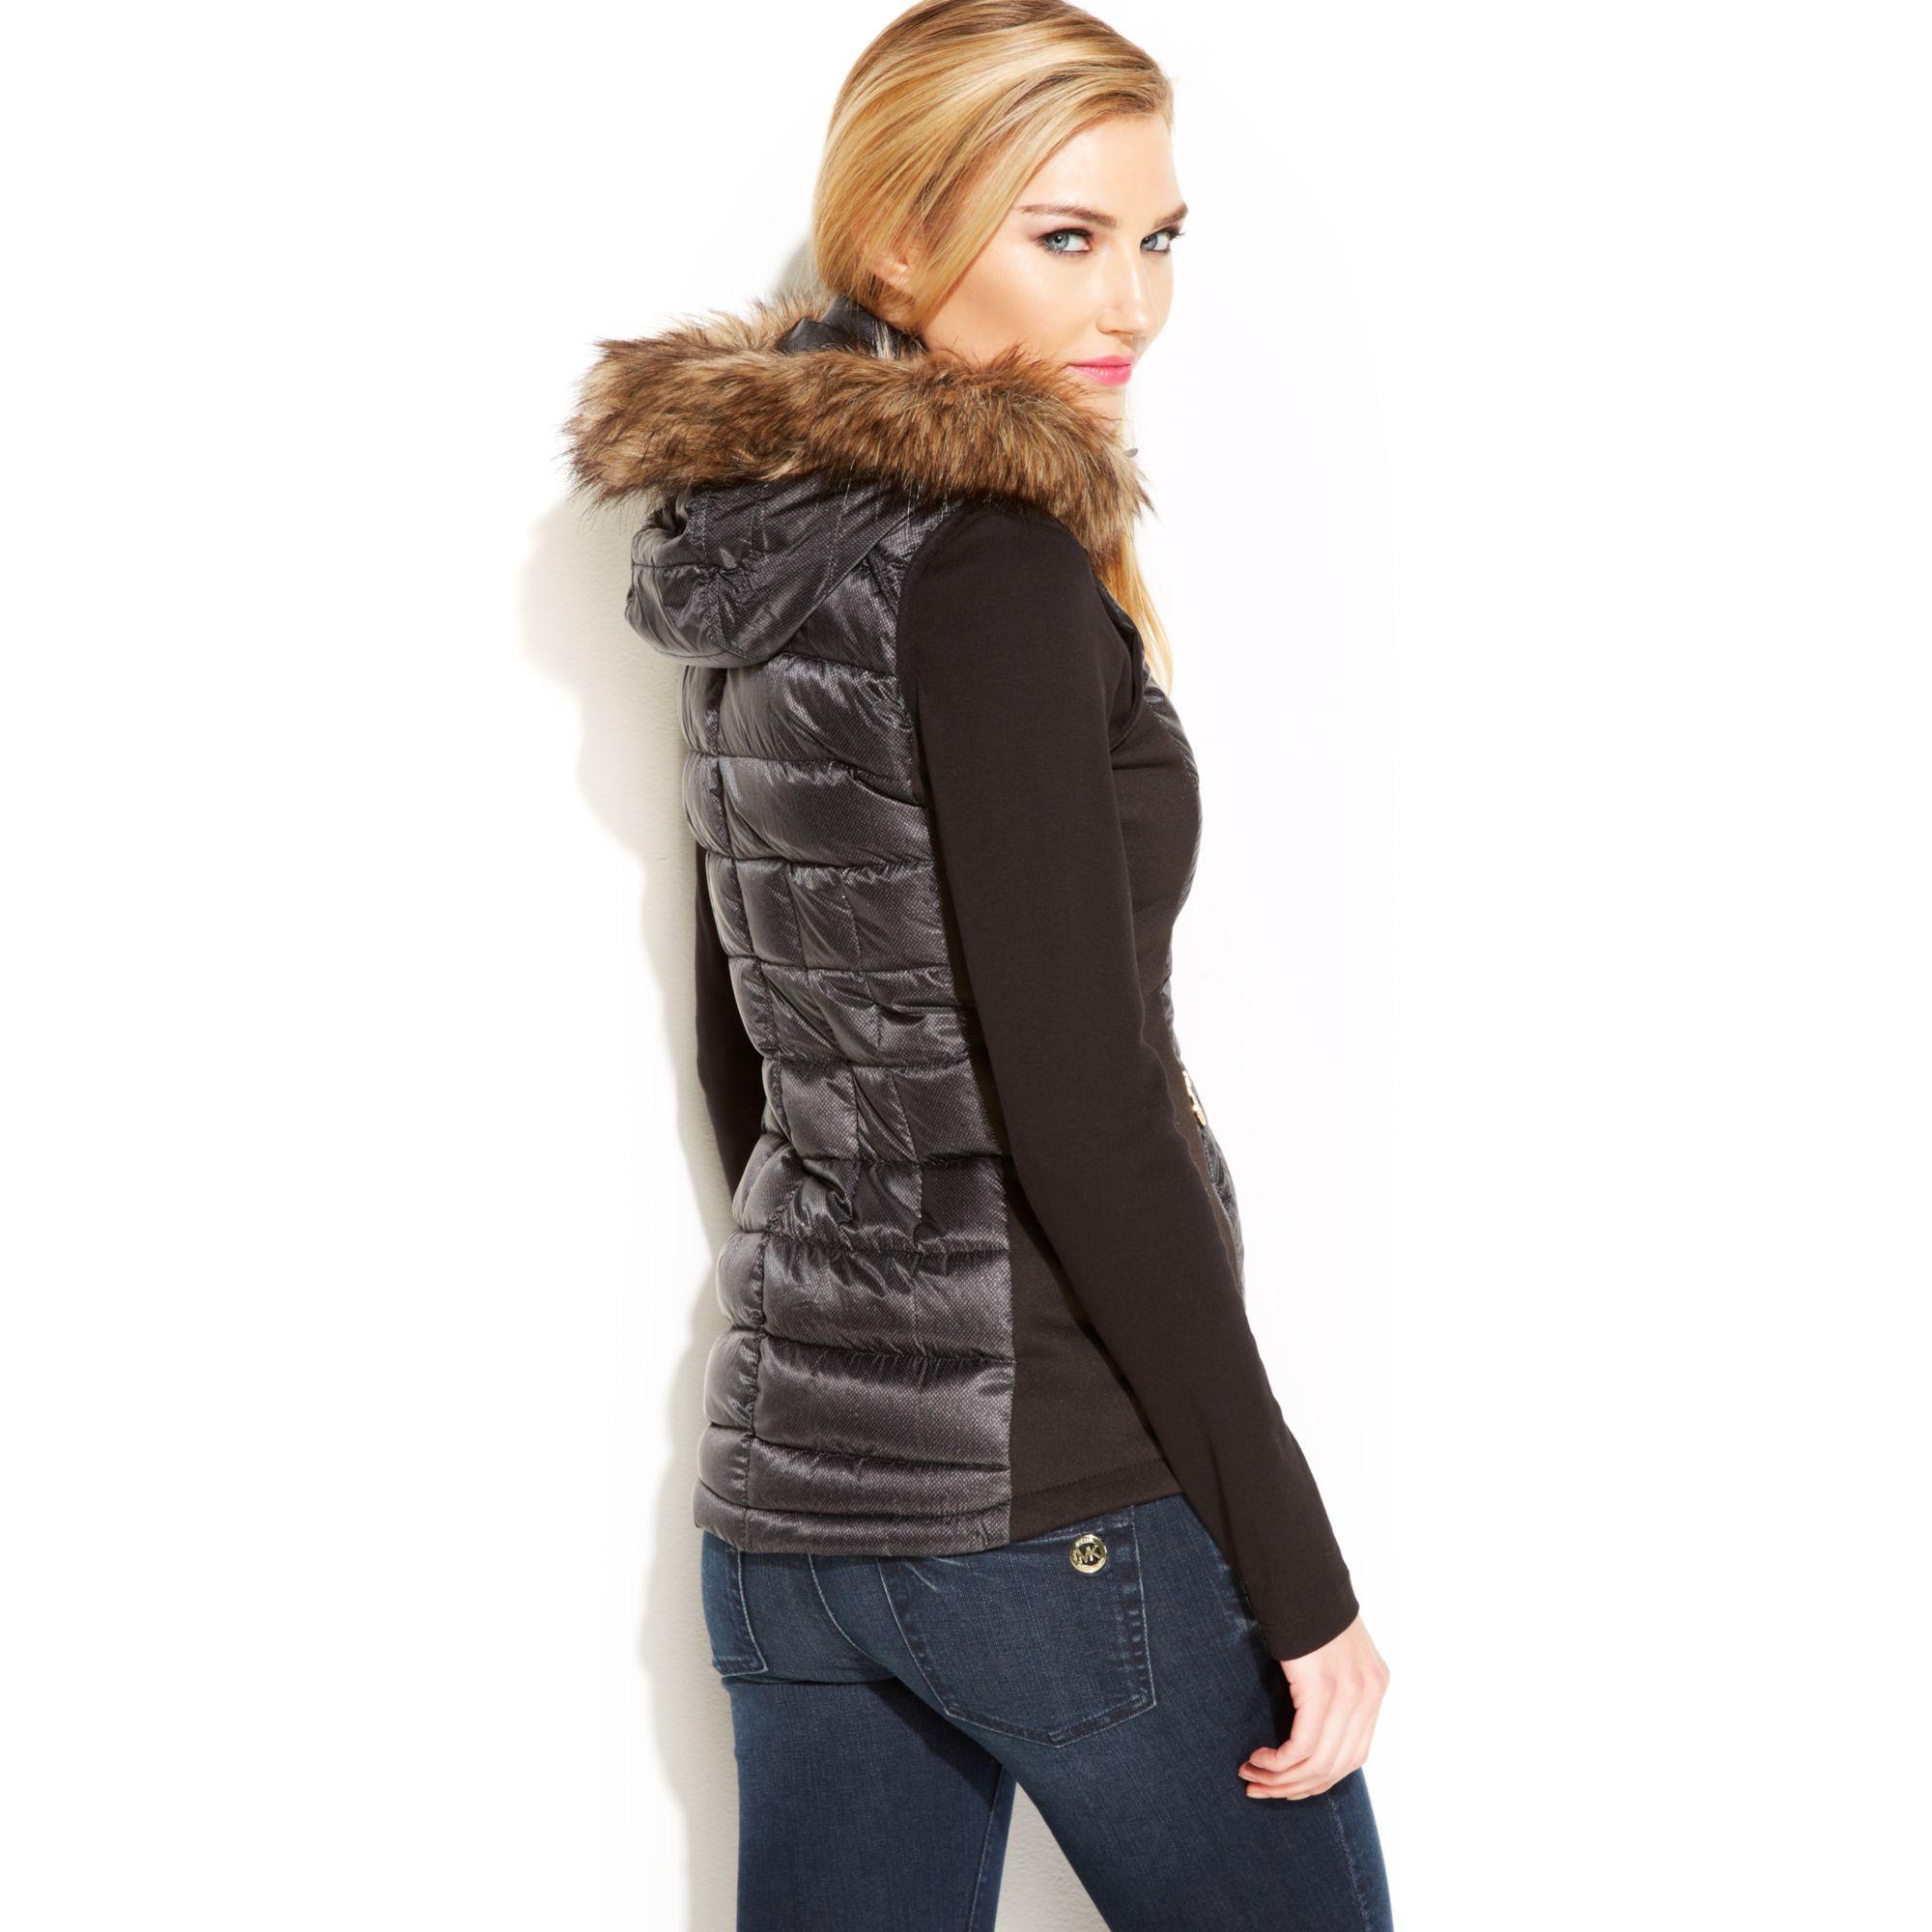 5a16ff70ac1c5e Michael Kors Michael Faux-fur-trim Printed Puffer Vest in Black - Lyst